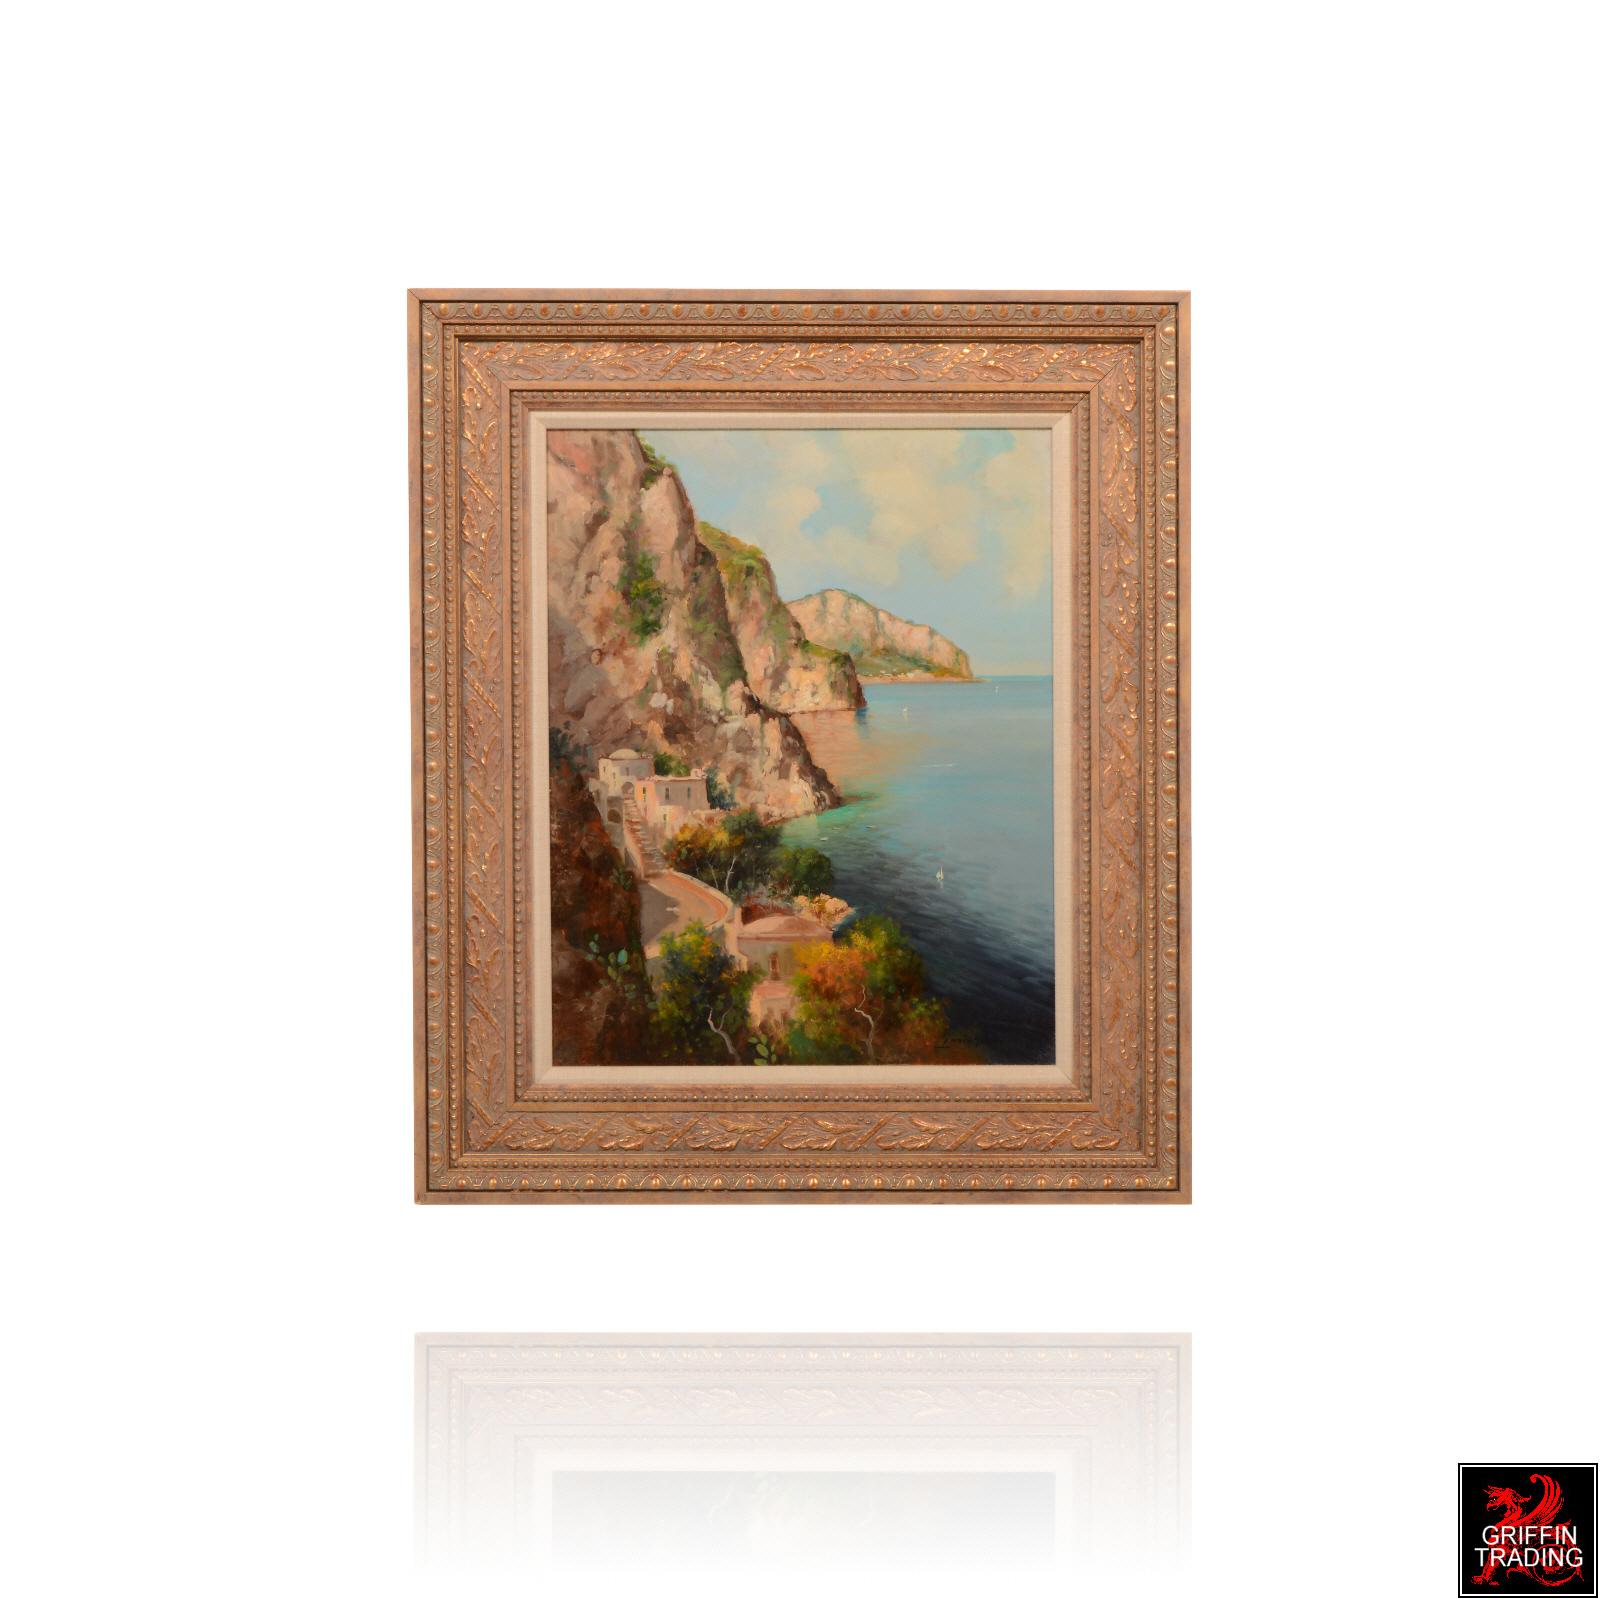 Amalfi Coast seascape painting with gold frame.